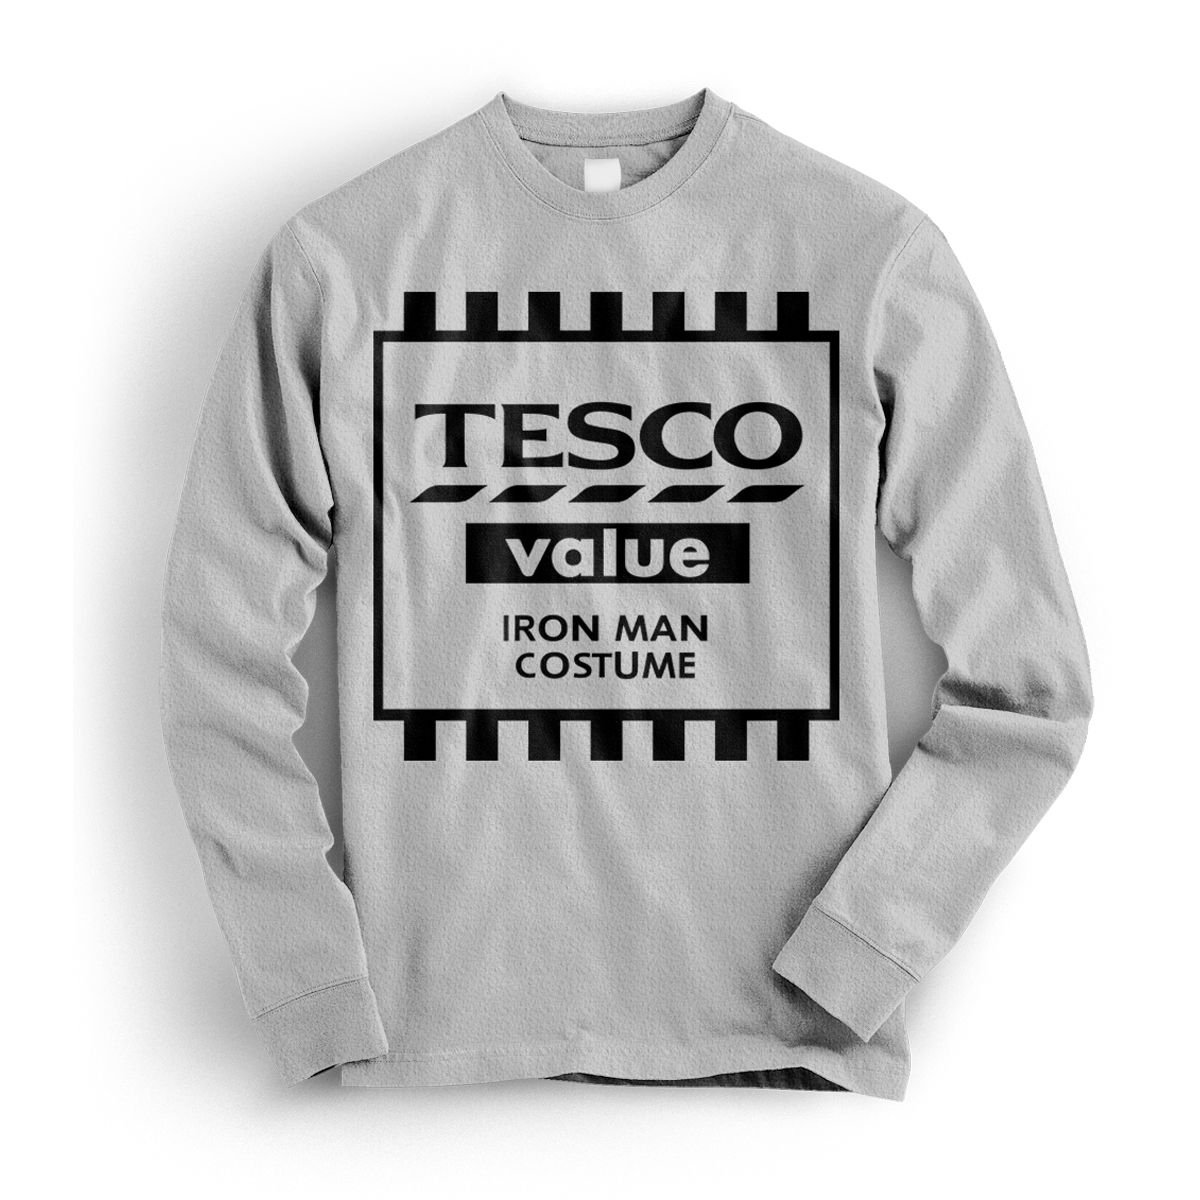 05332f20d Boys white shirts 2 pack Source · Plain Black Polo Shirt Tesco Cotswold Hire